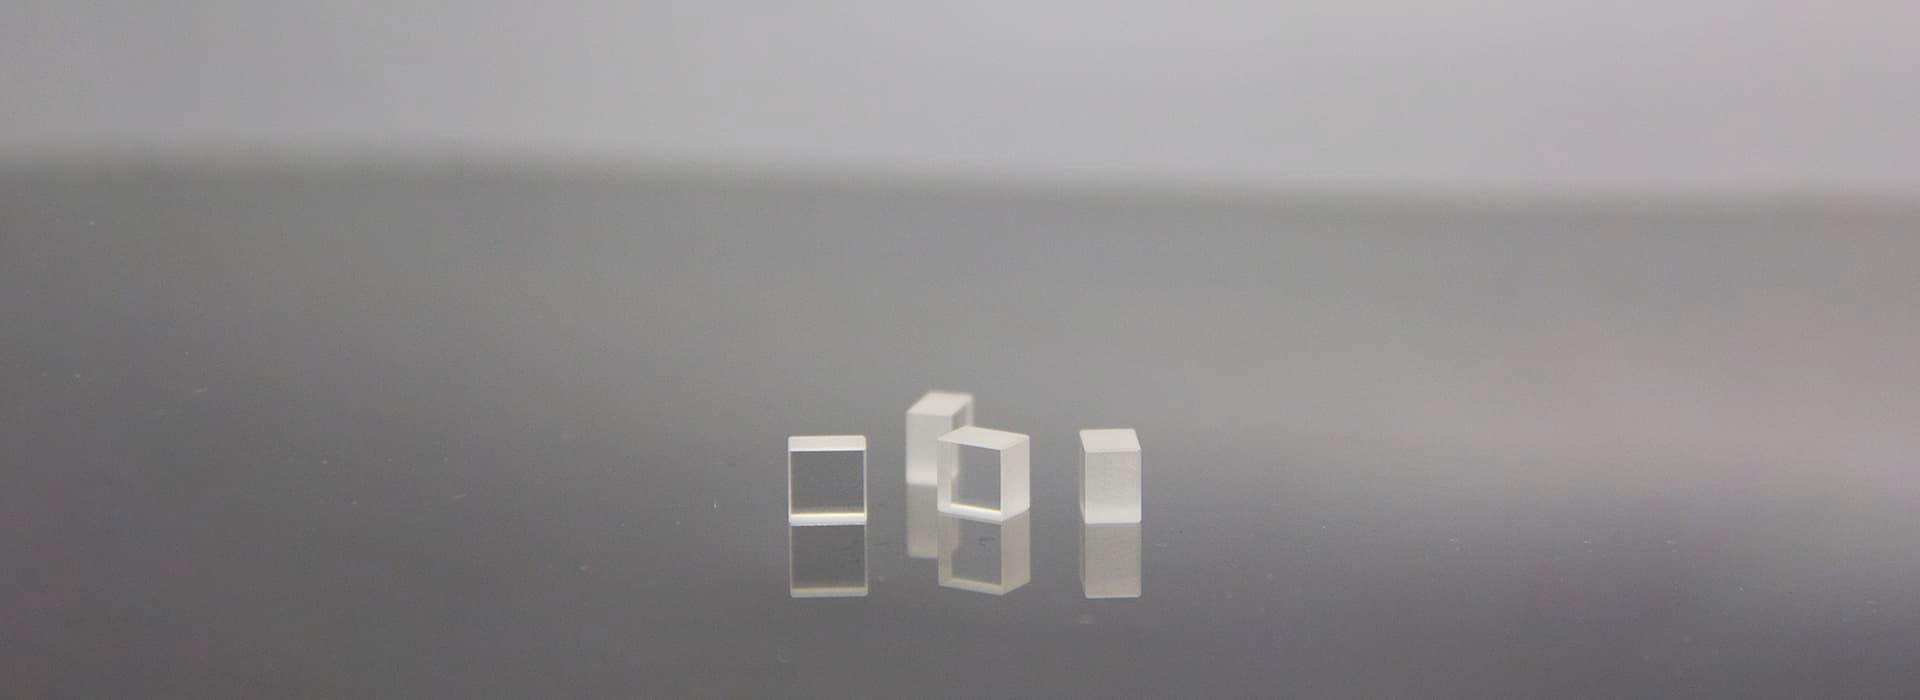 Yb-CALGO 激光晶体-南京光宝-CRYLINK